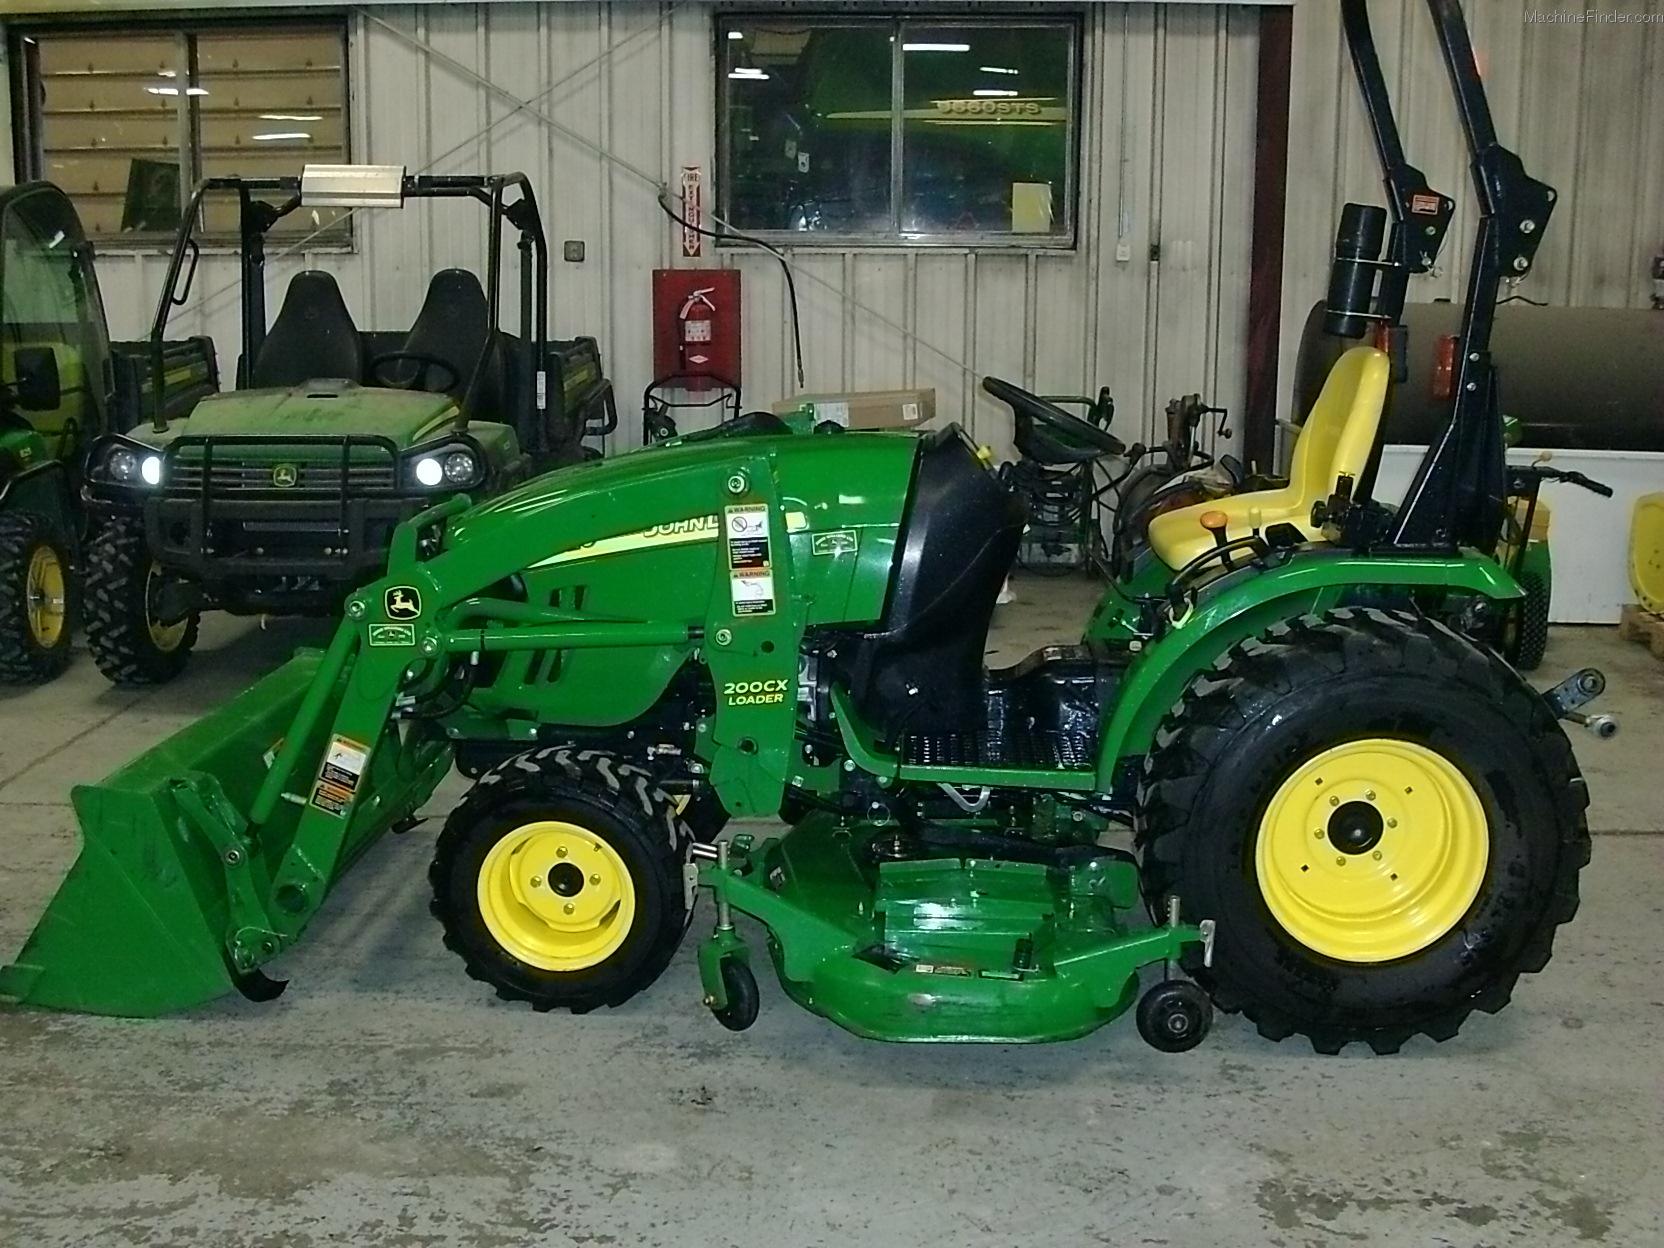 2011 John Deere 2520 Tractors - Compact (1-40hp.) - John ...